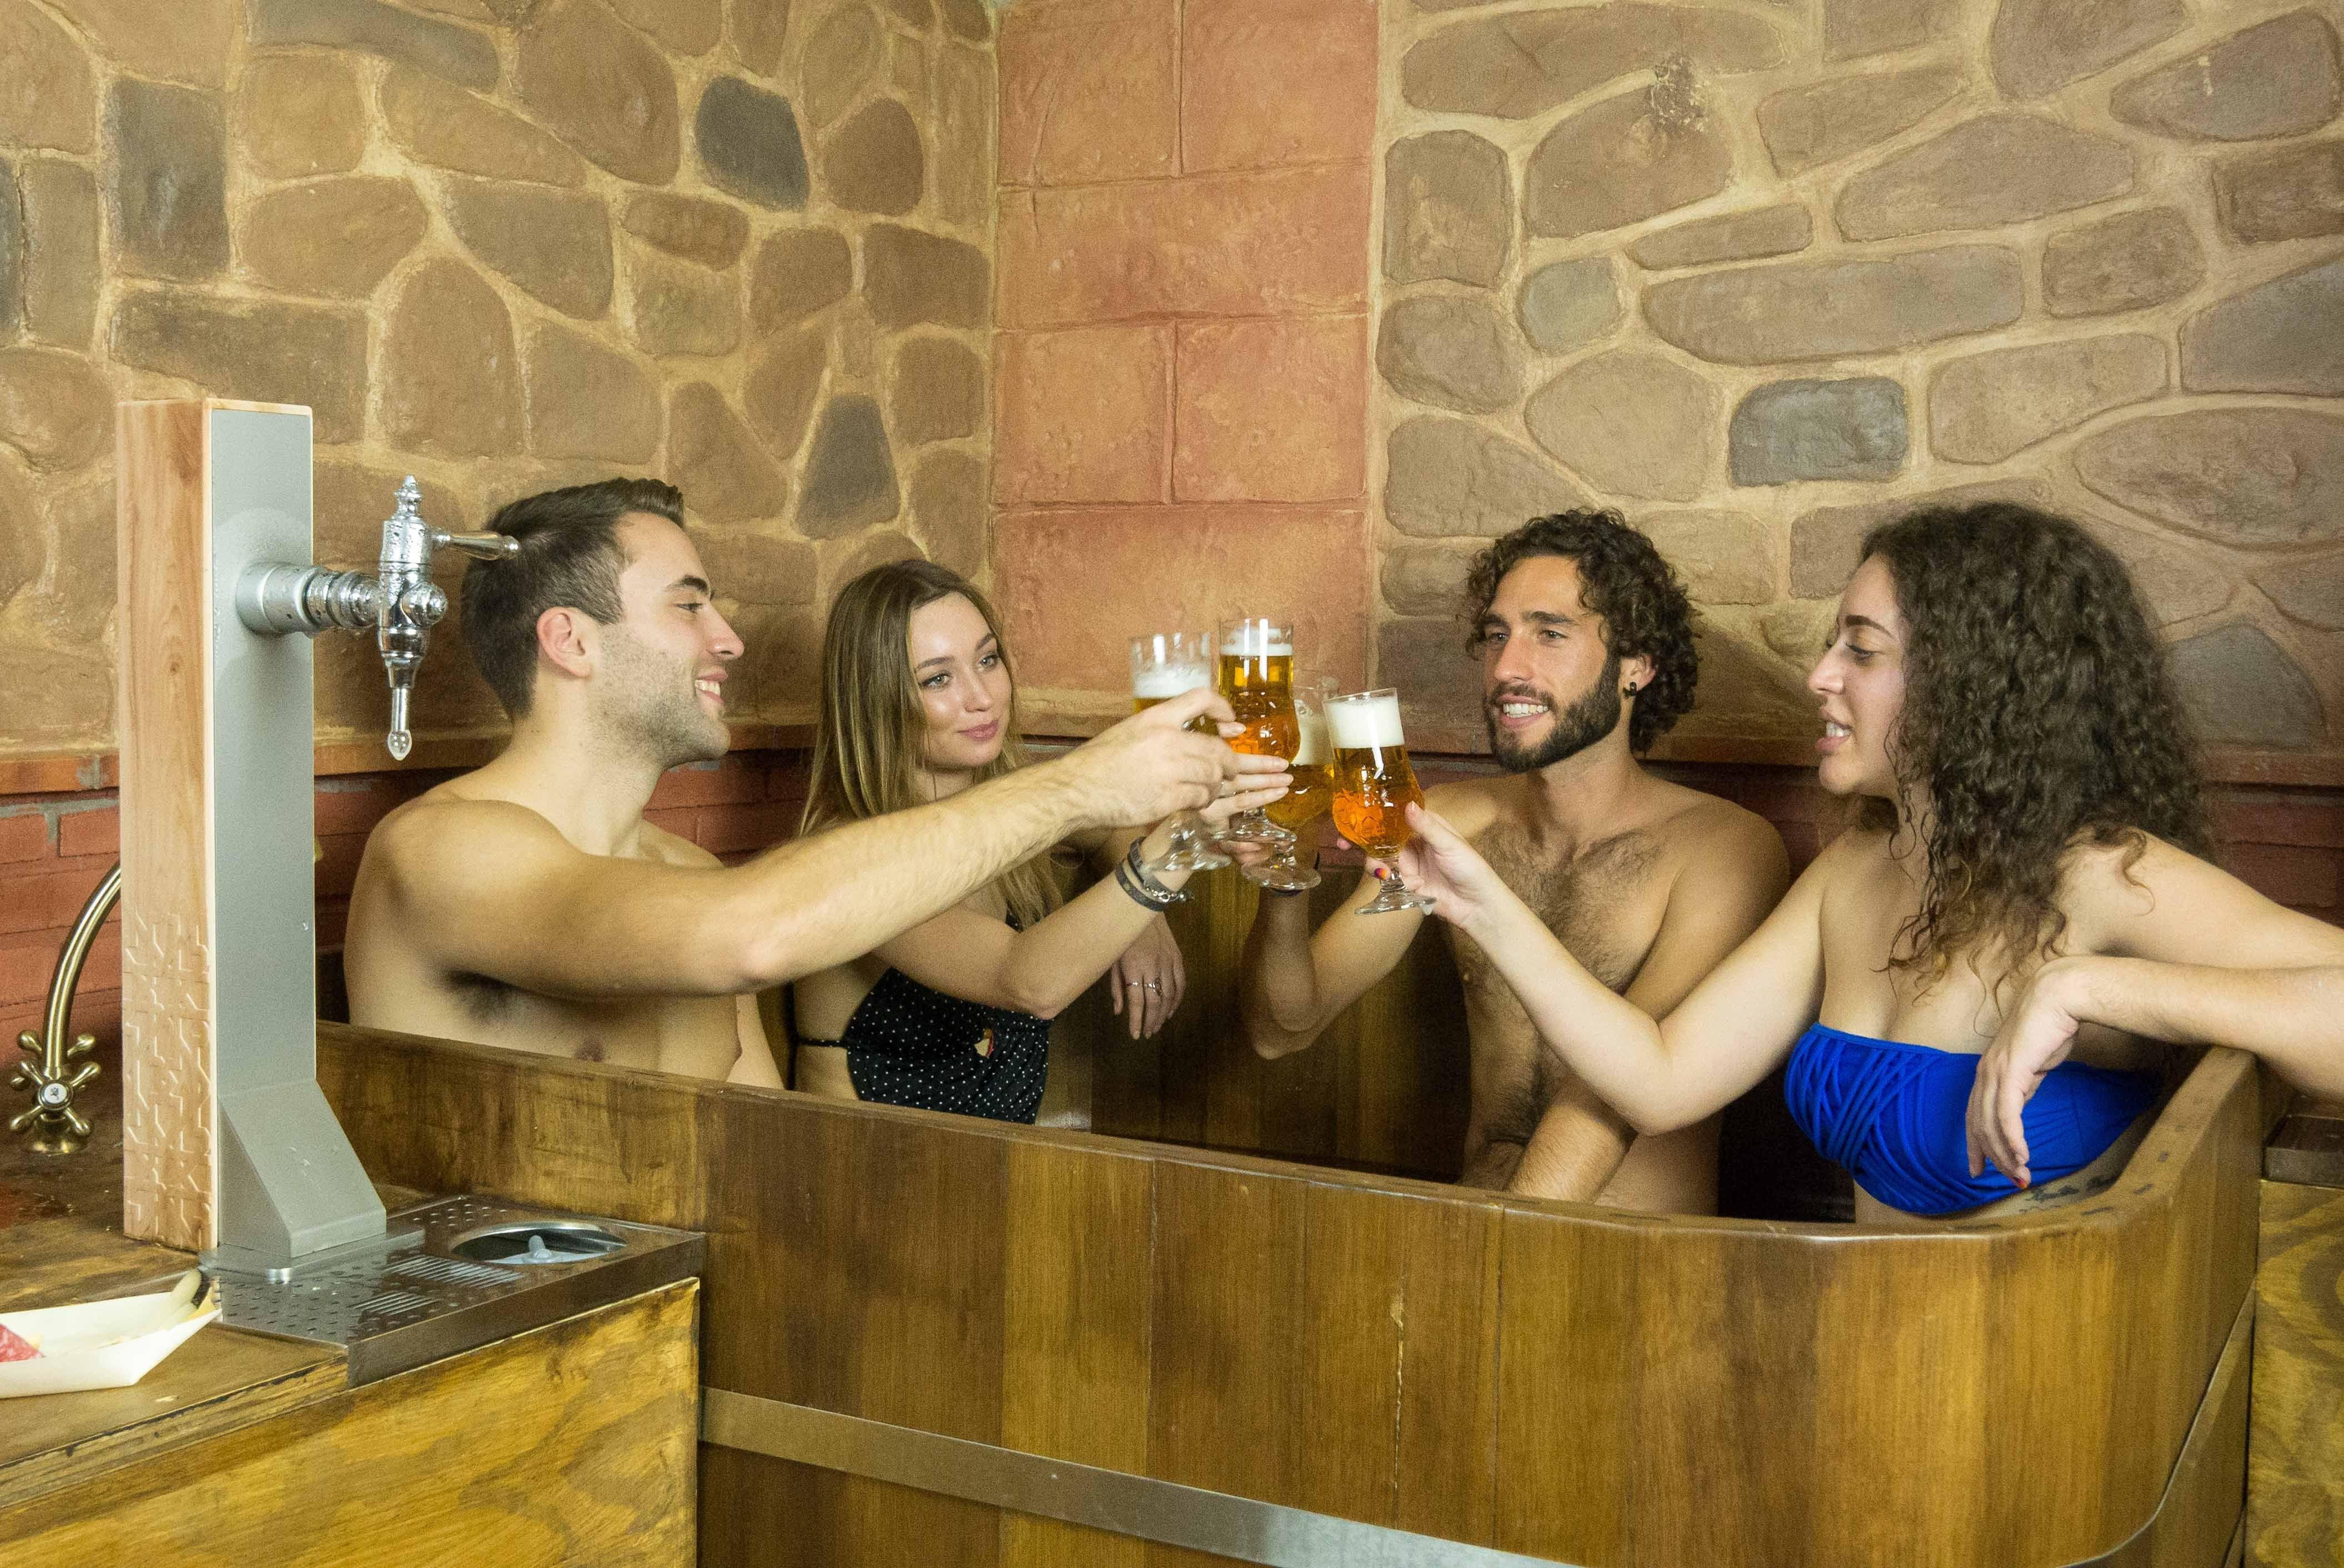 Beer Spa Internacional S.L